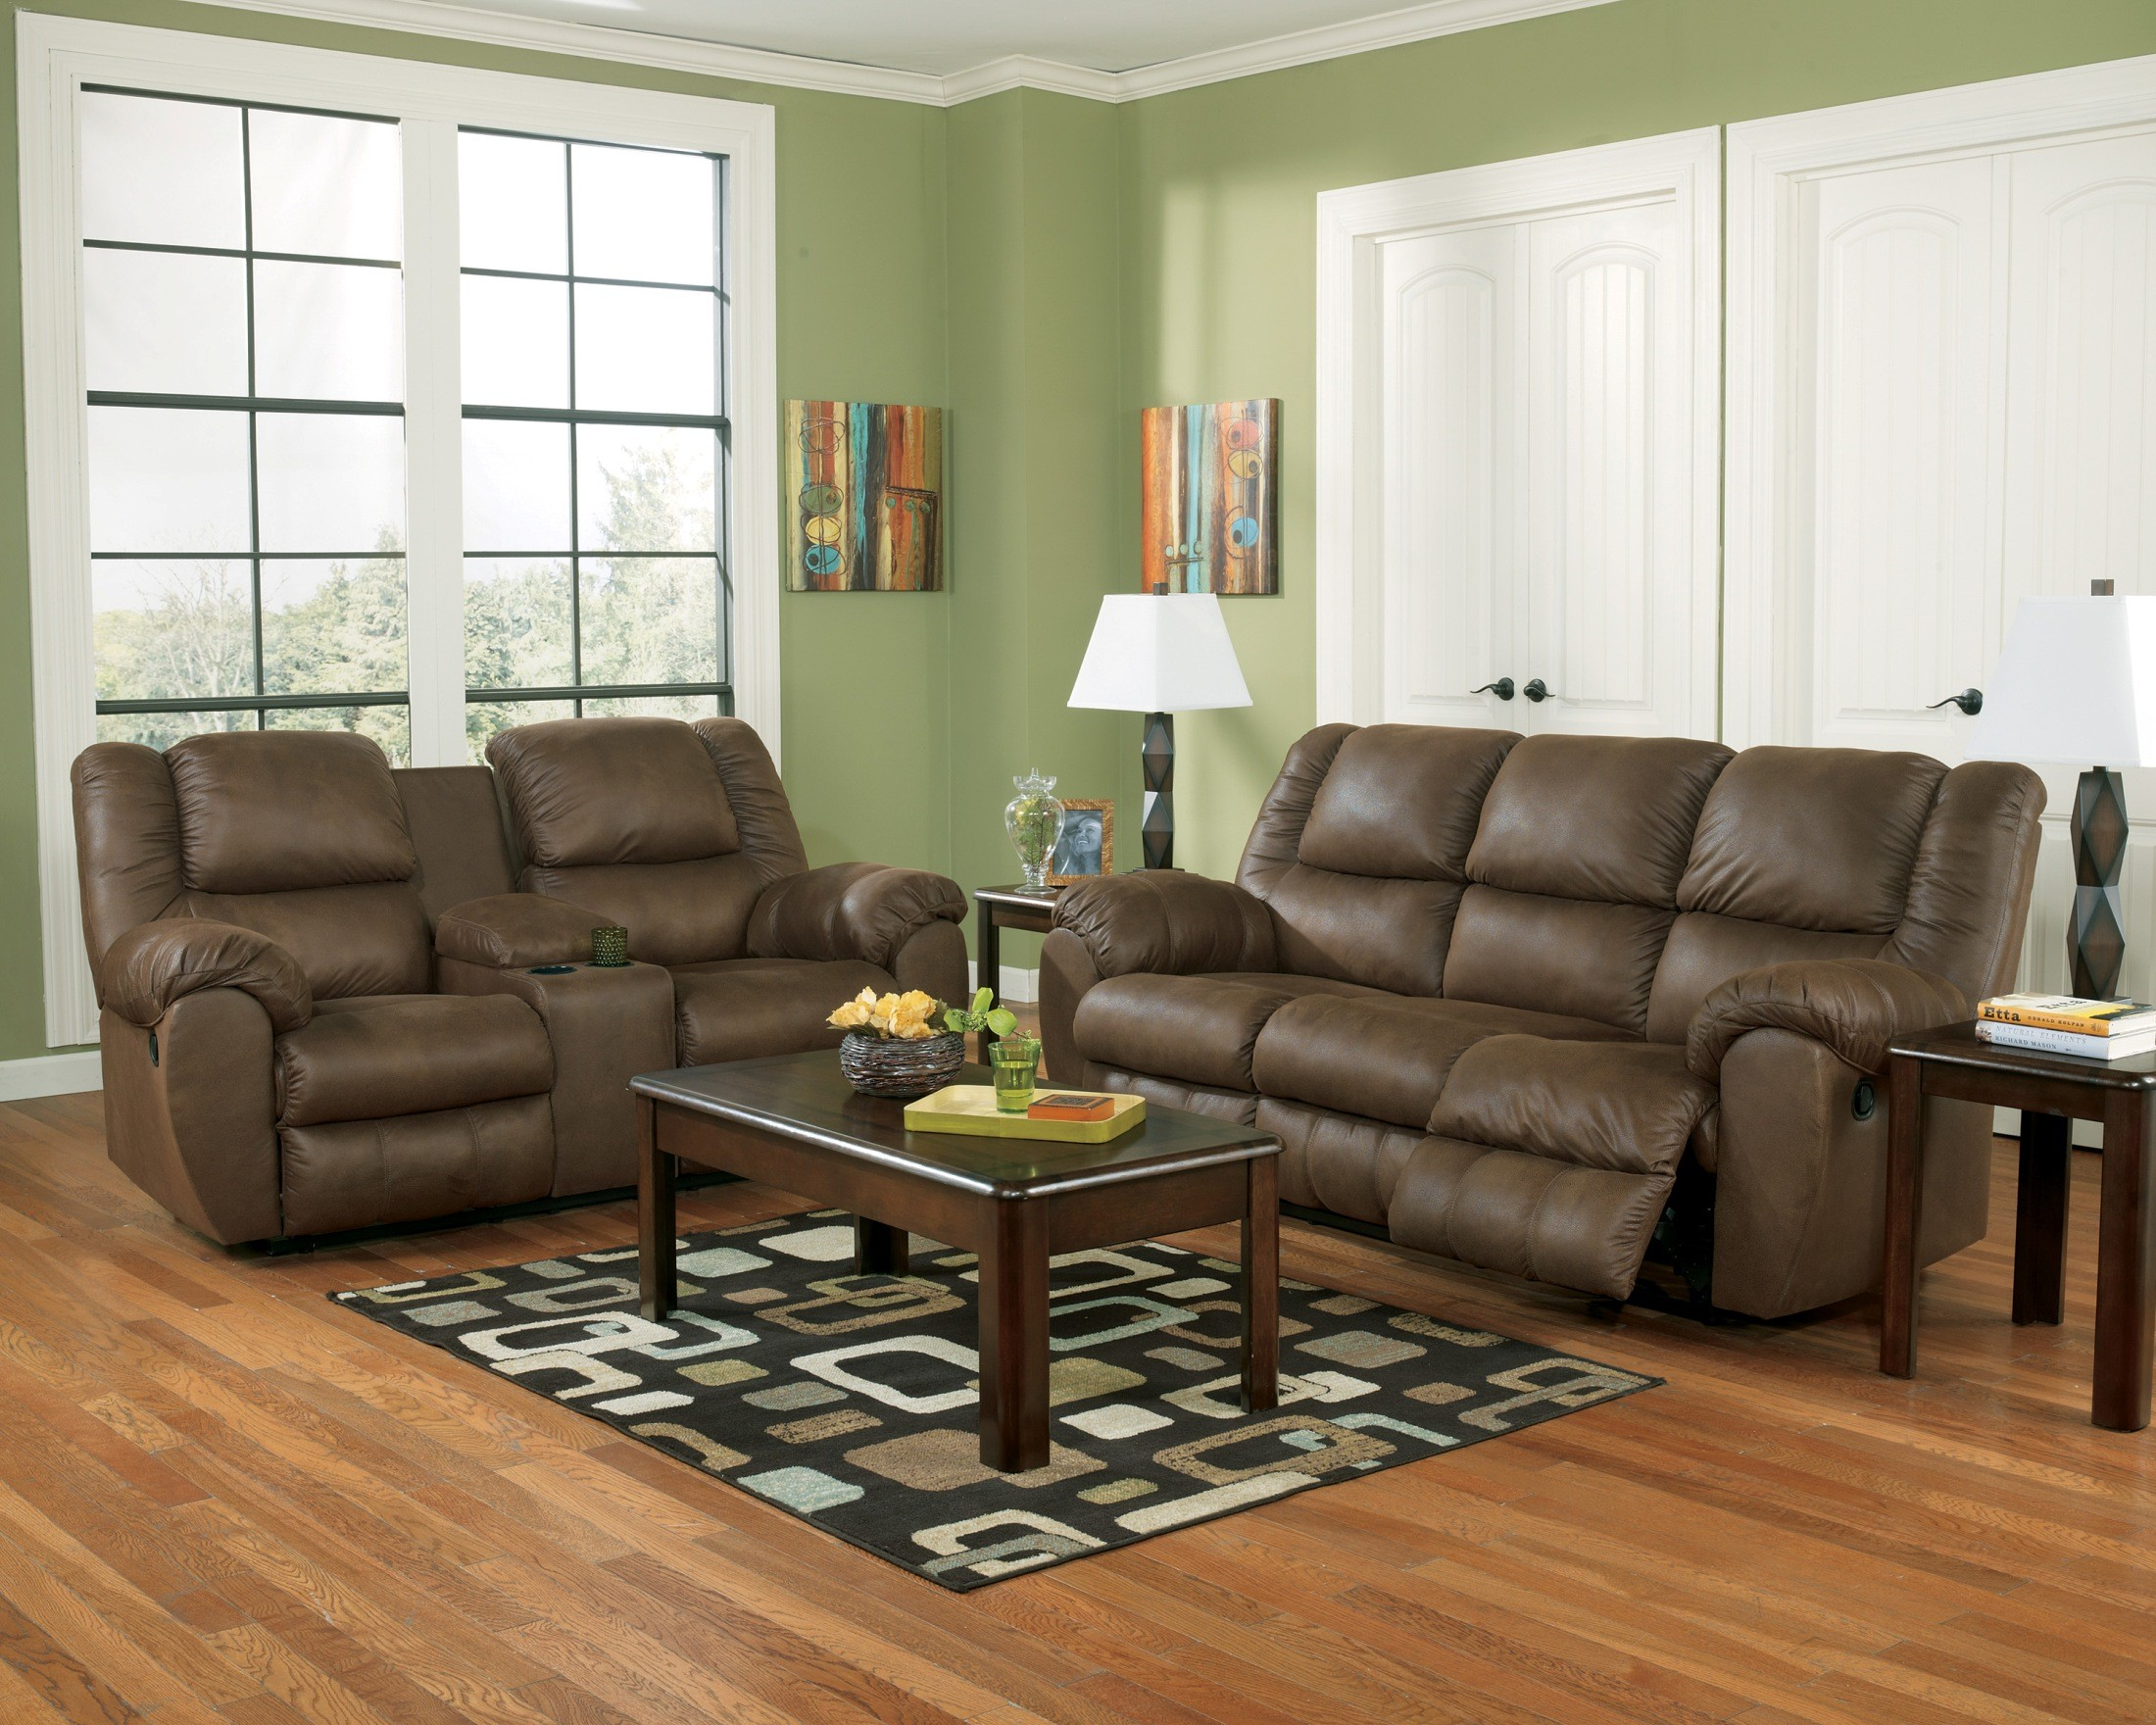 Quarterback Canyon Reclining Living Room Set From Ashley